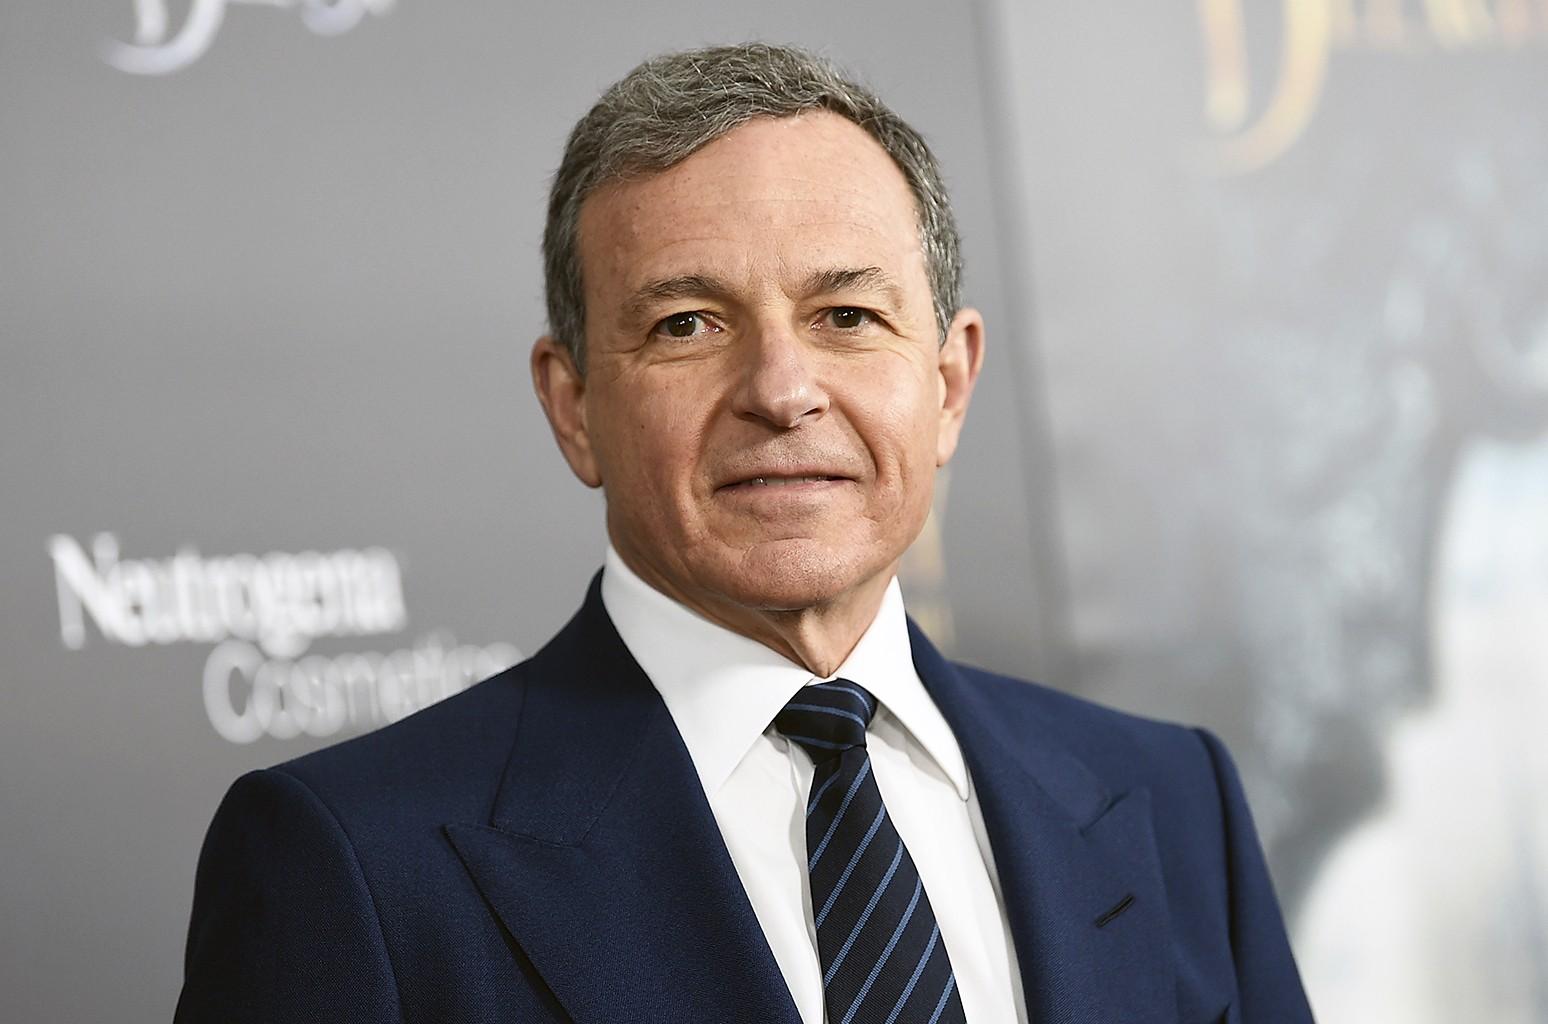 The Walt Disney Company CEO Robert Iger